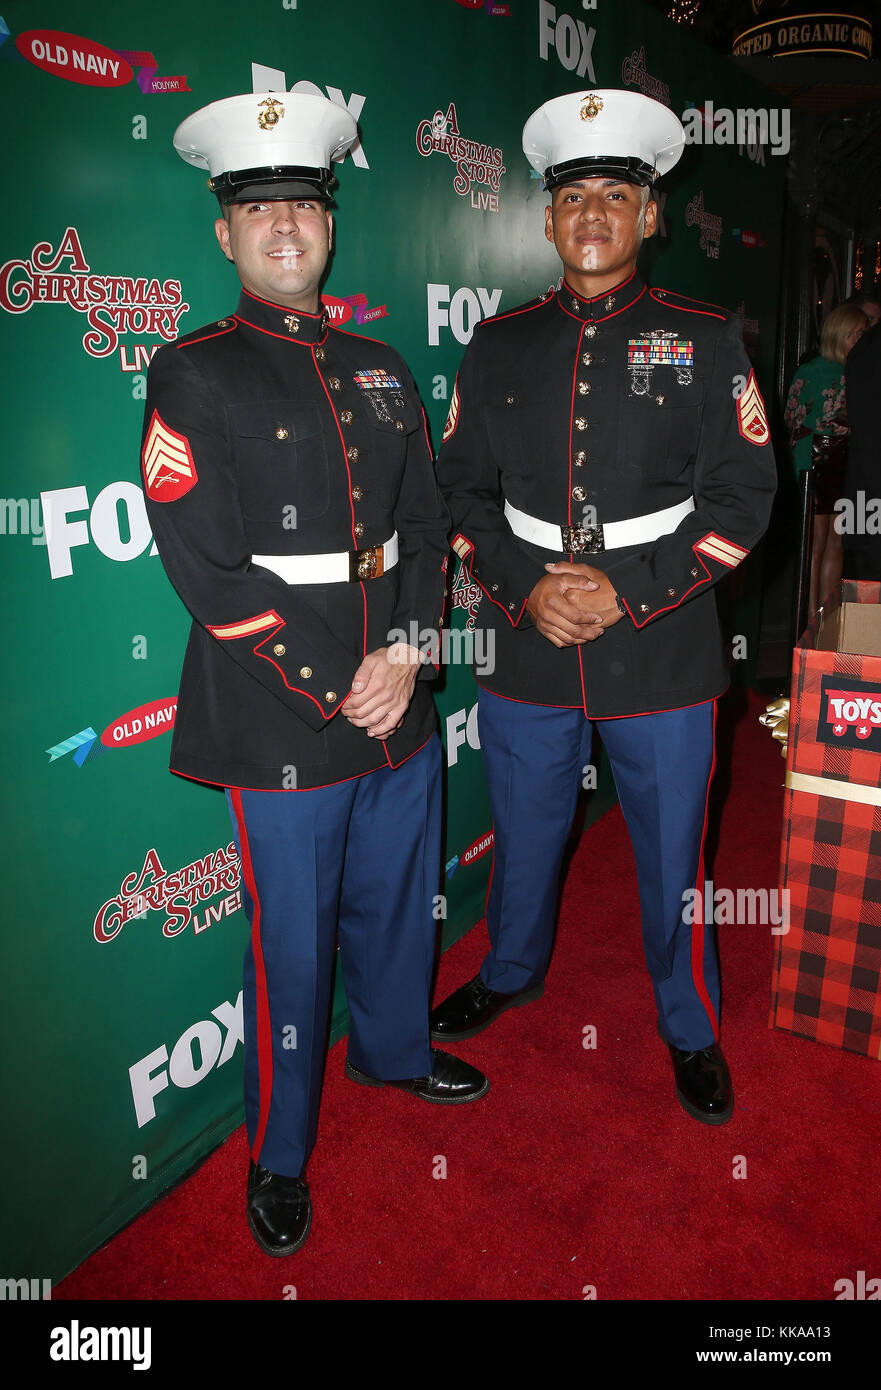 Los Angeles, California, USA. 24th Nov, 2017. 25 November 2017 - Los Angeles, California - Marines. FOX's ''A Christmas Stock Photo